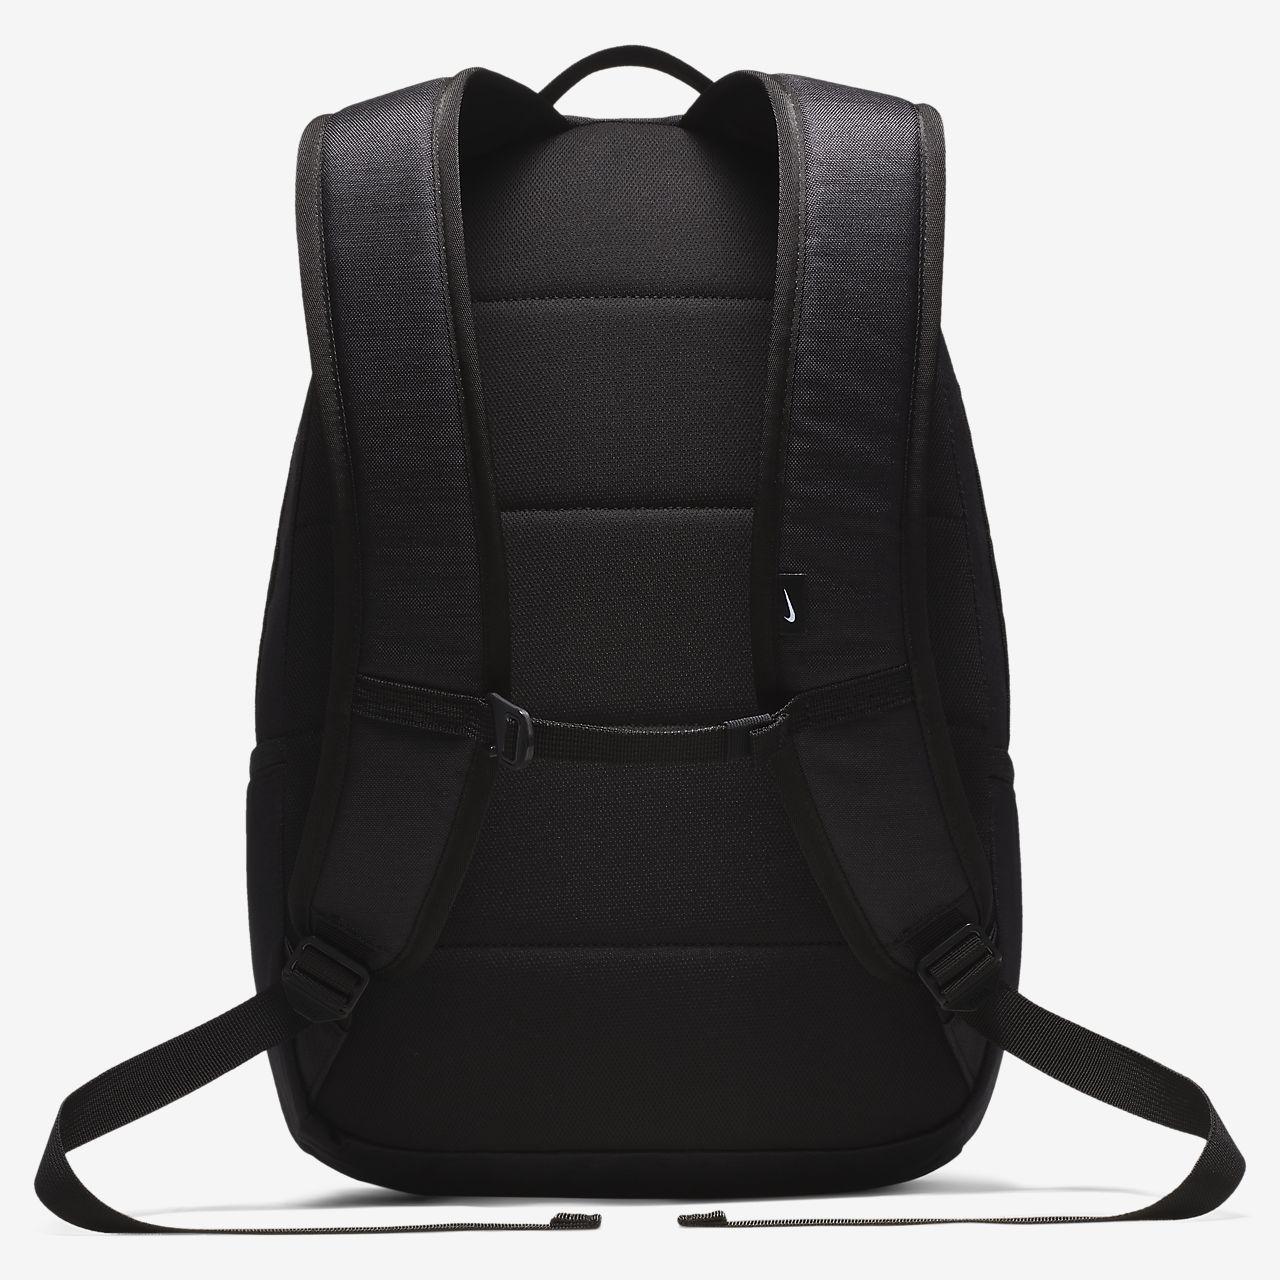 Buy nike air max school bags   up to 53% Discounts 3b61d1fc7c